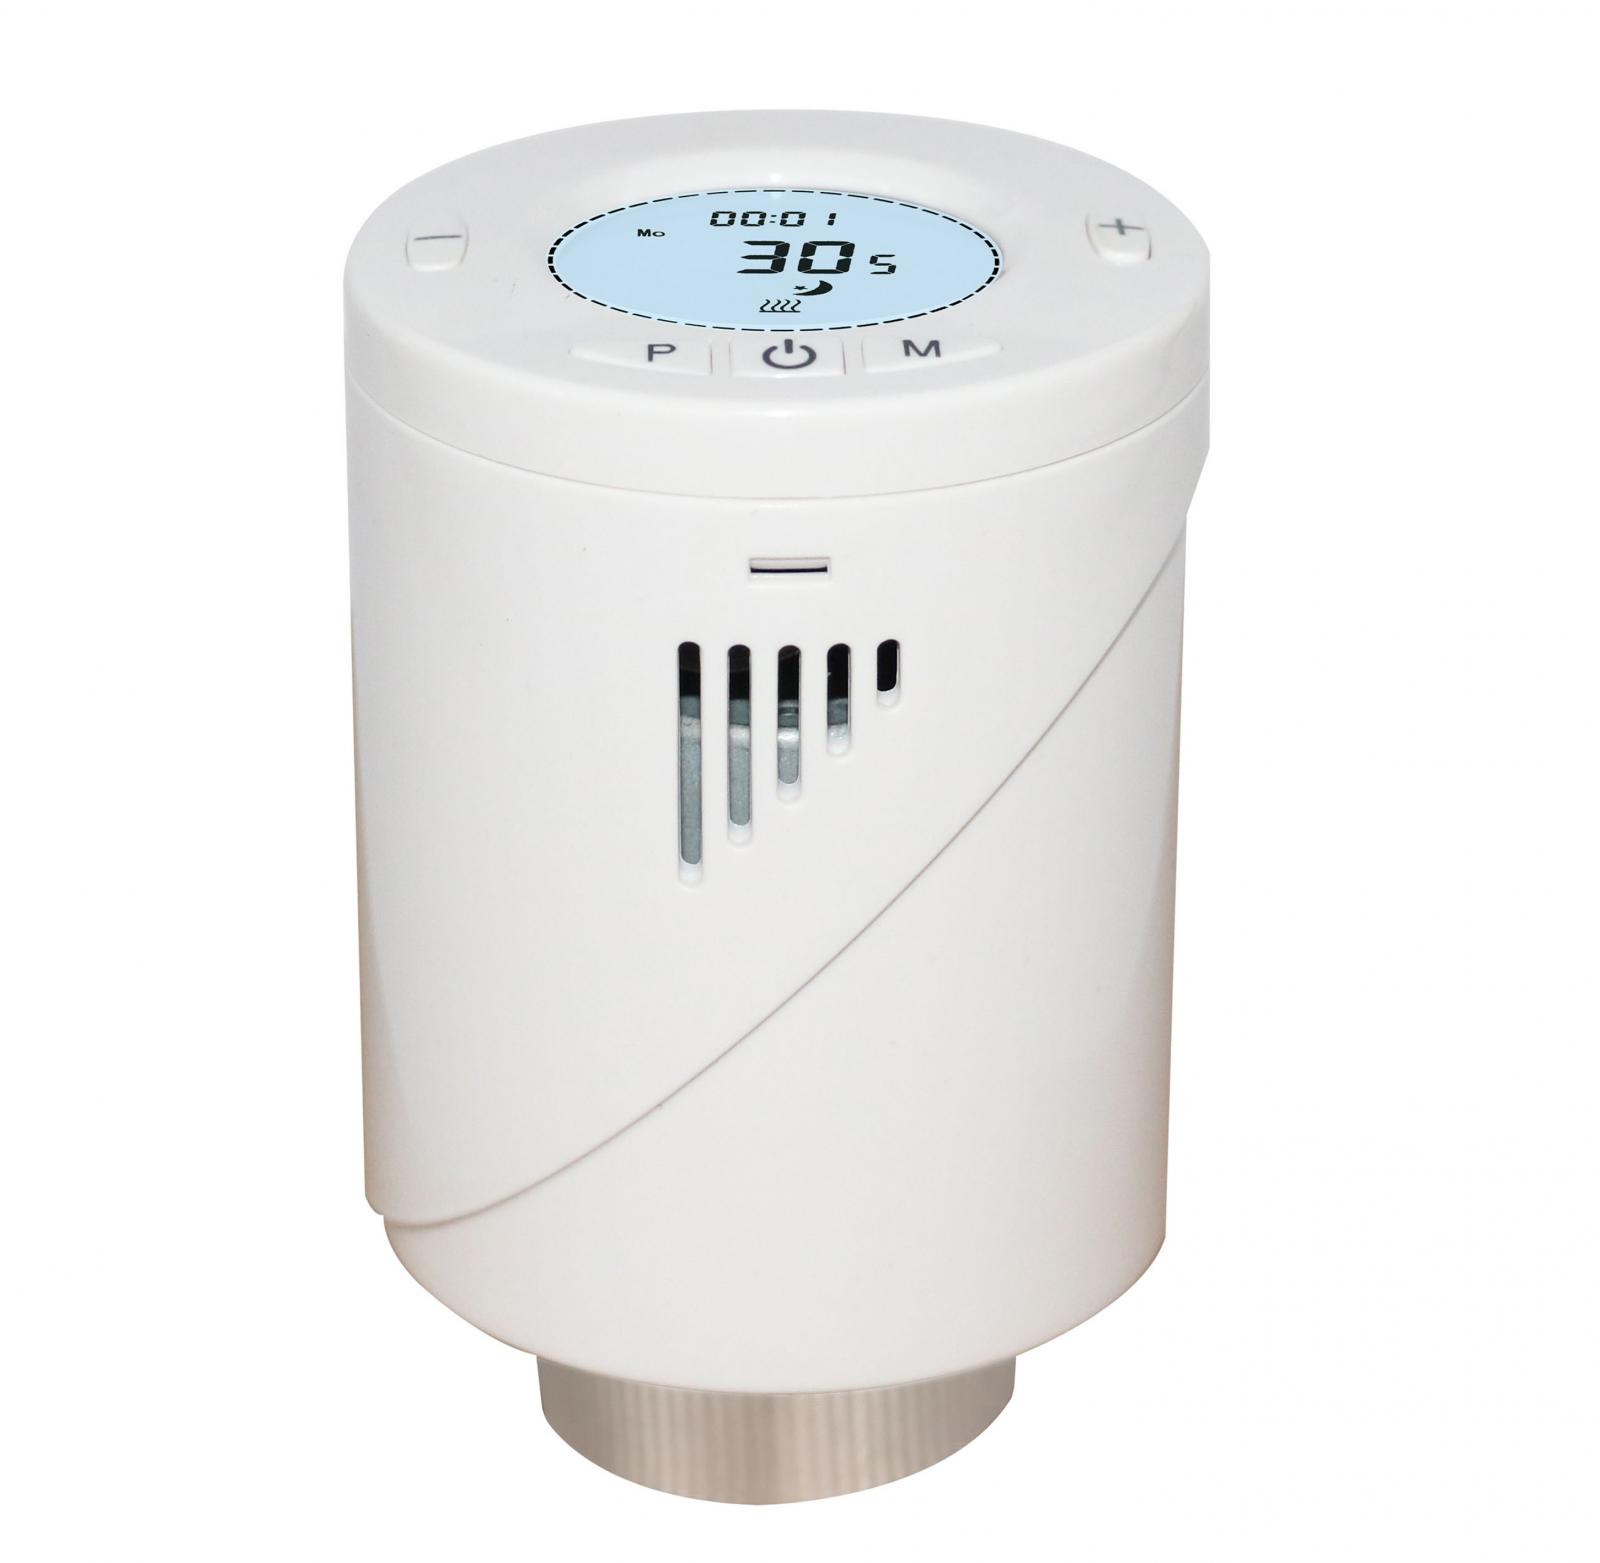 Immax SMART termostatická hlavica 07703L